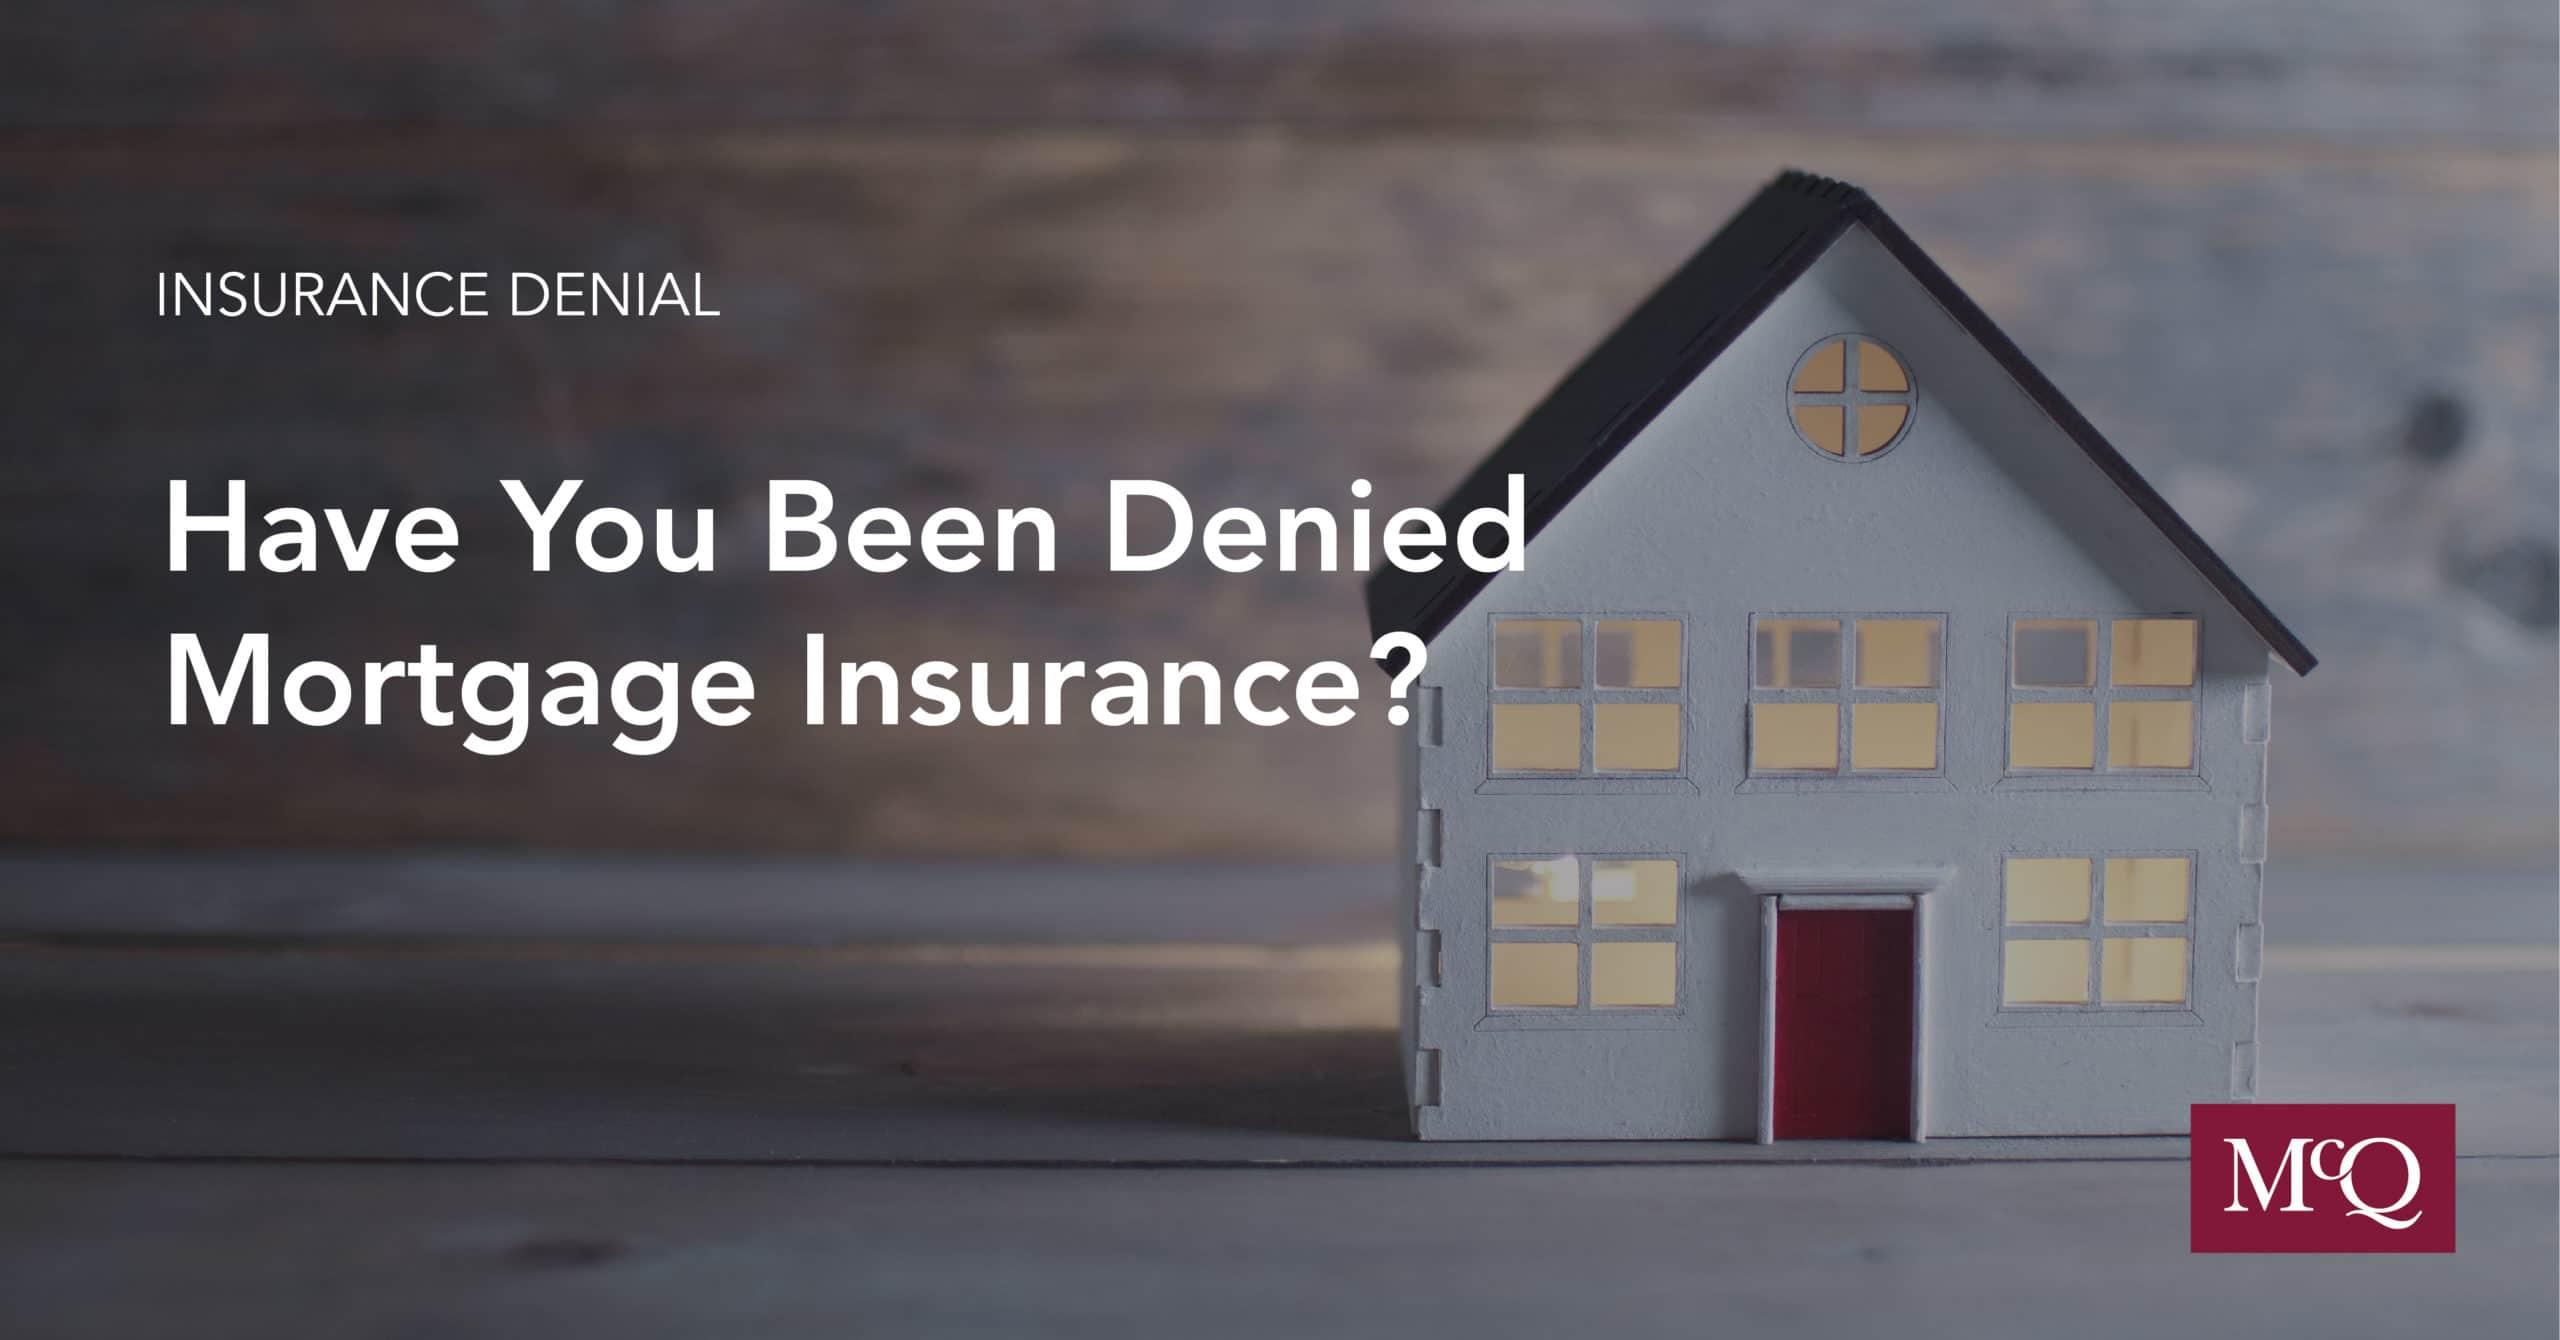 Insurance Denial Blog Mortgage Insurance